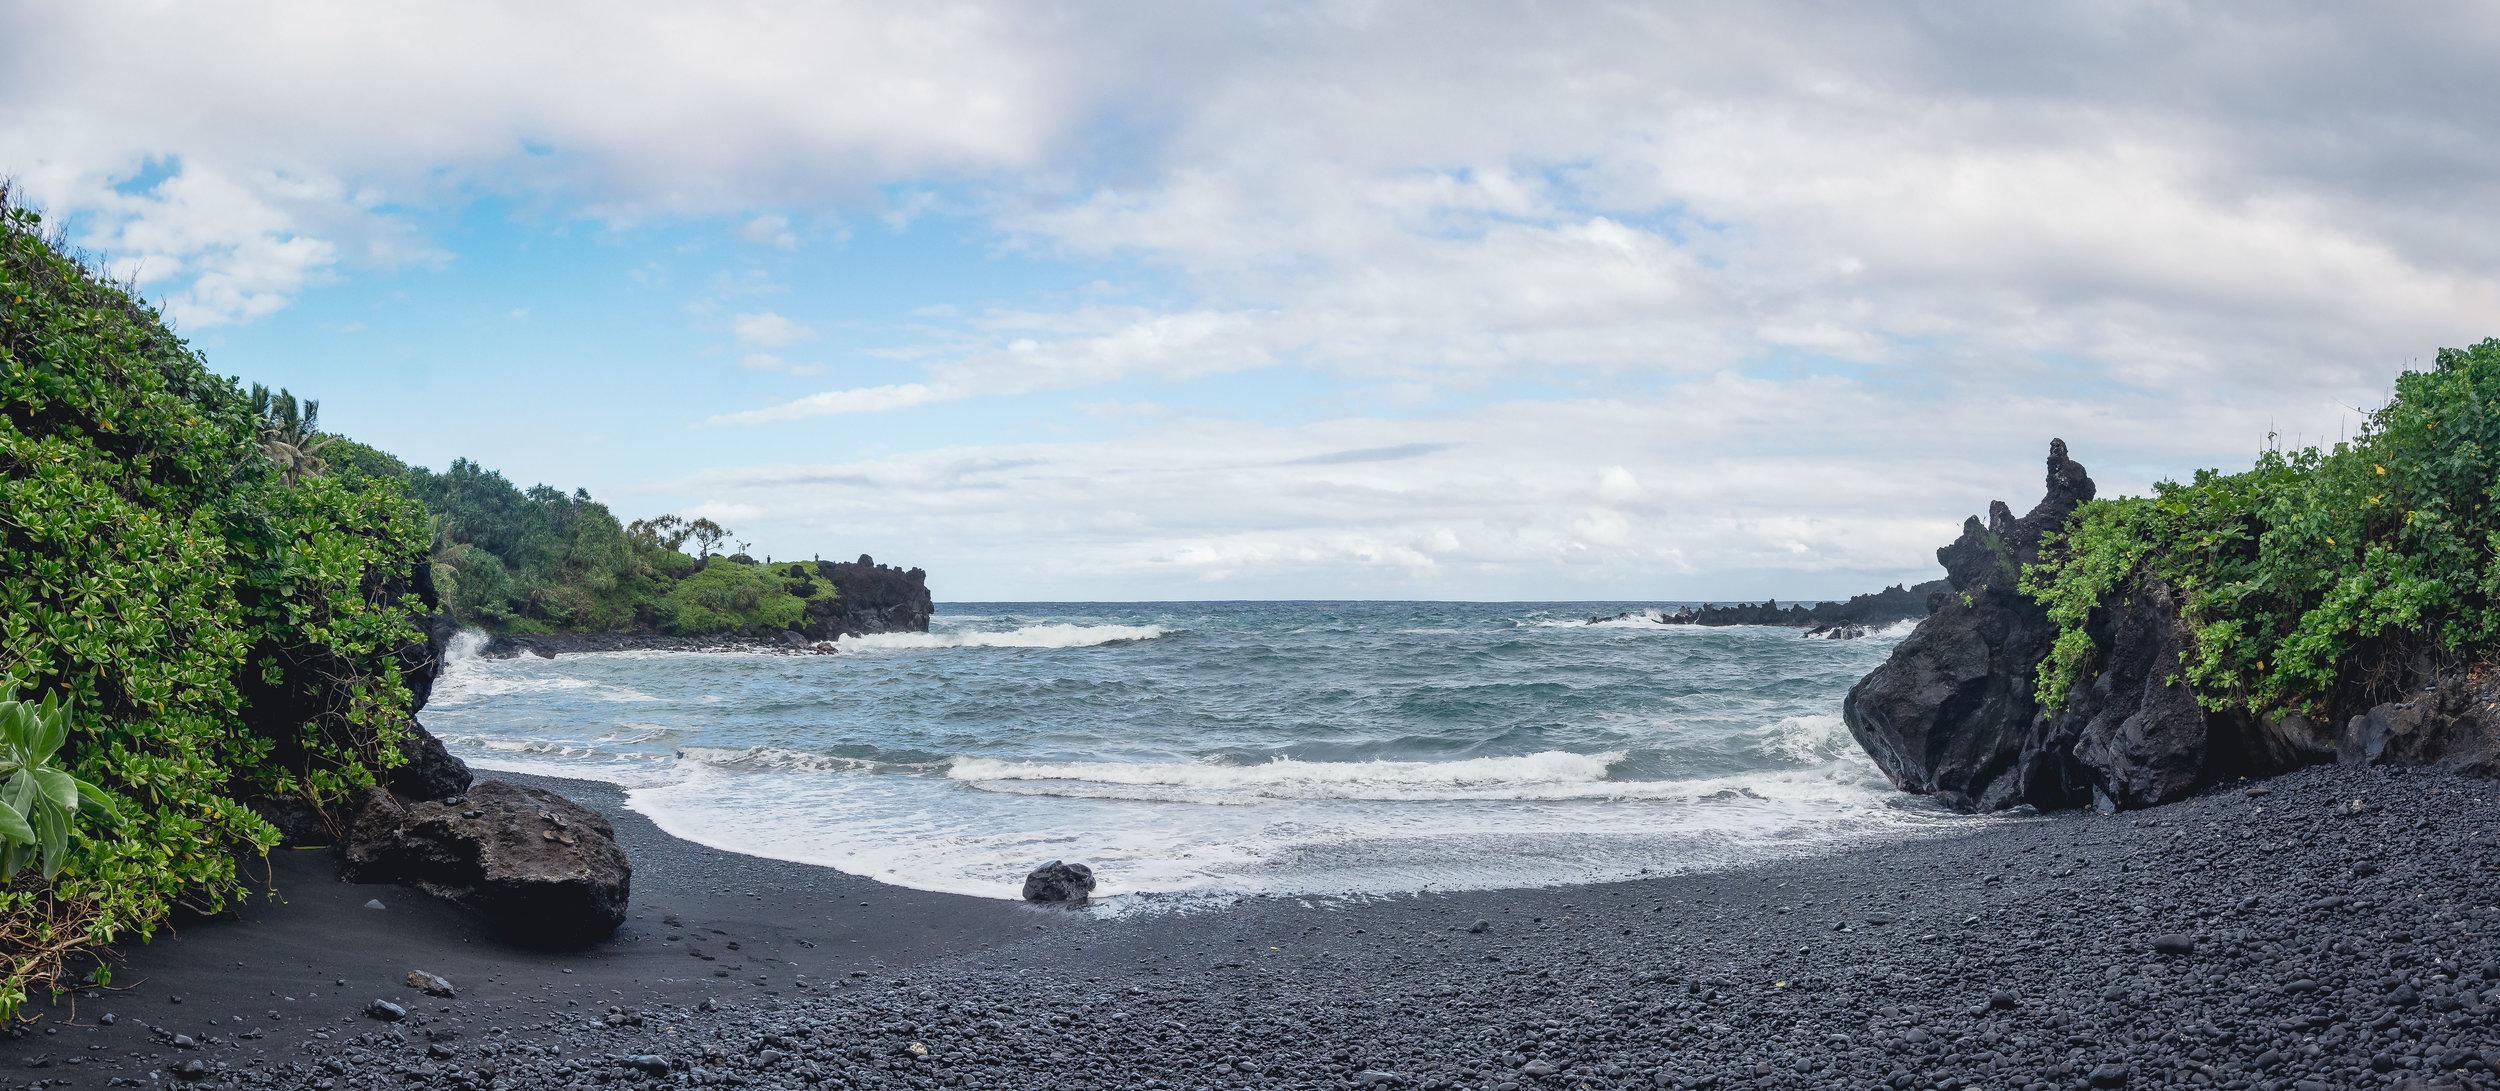 Maui 2016_41.jpg